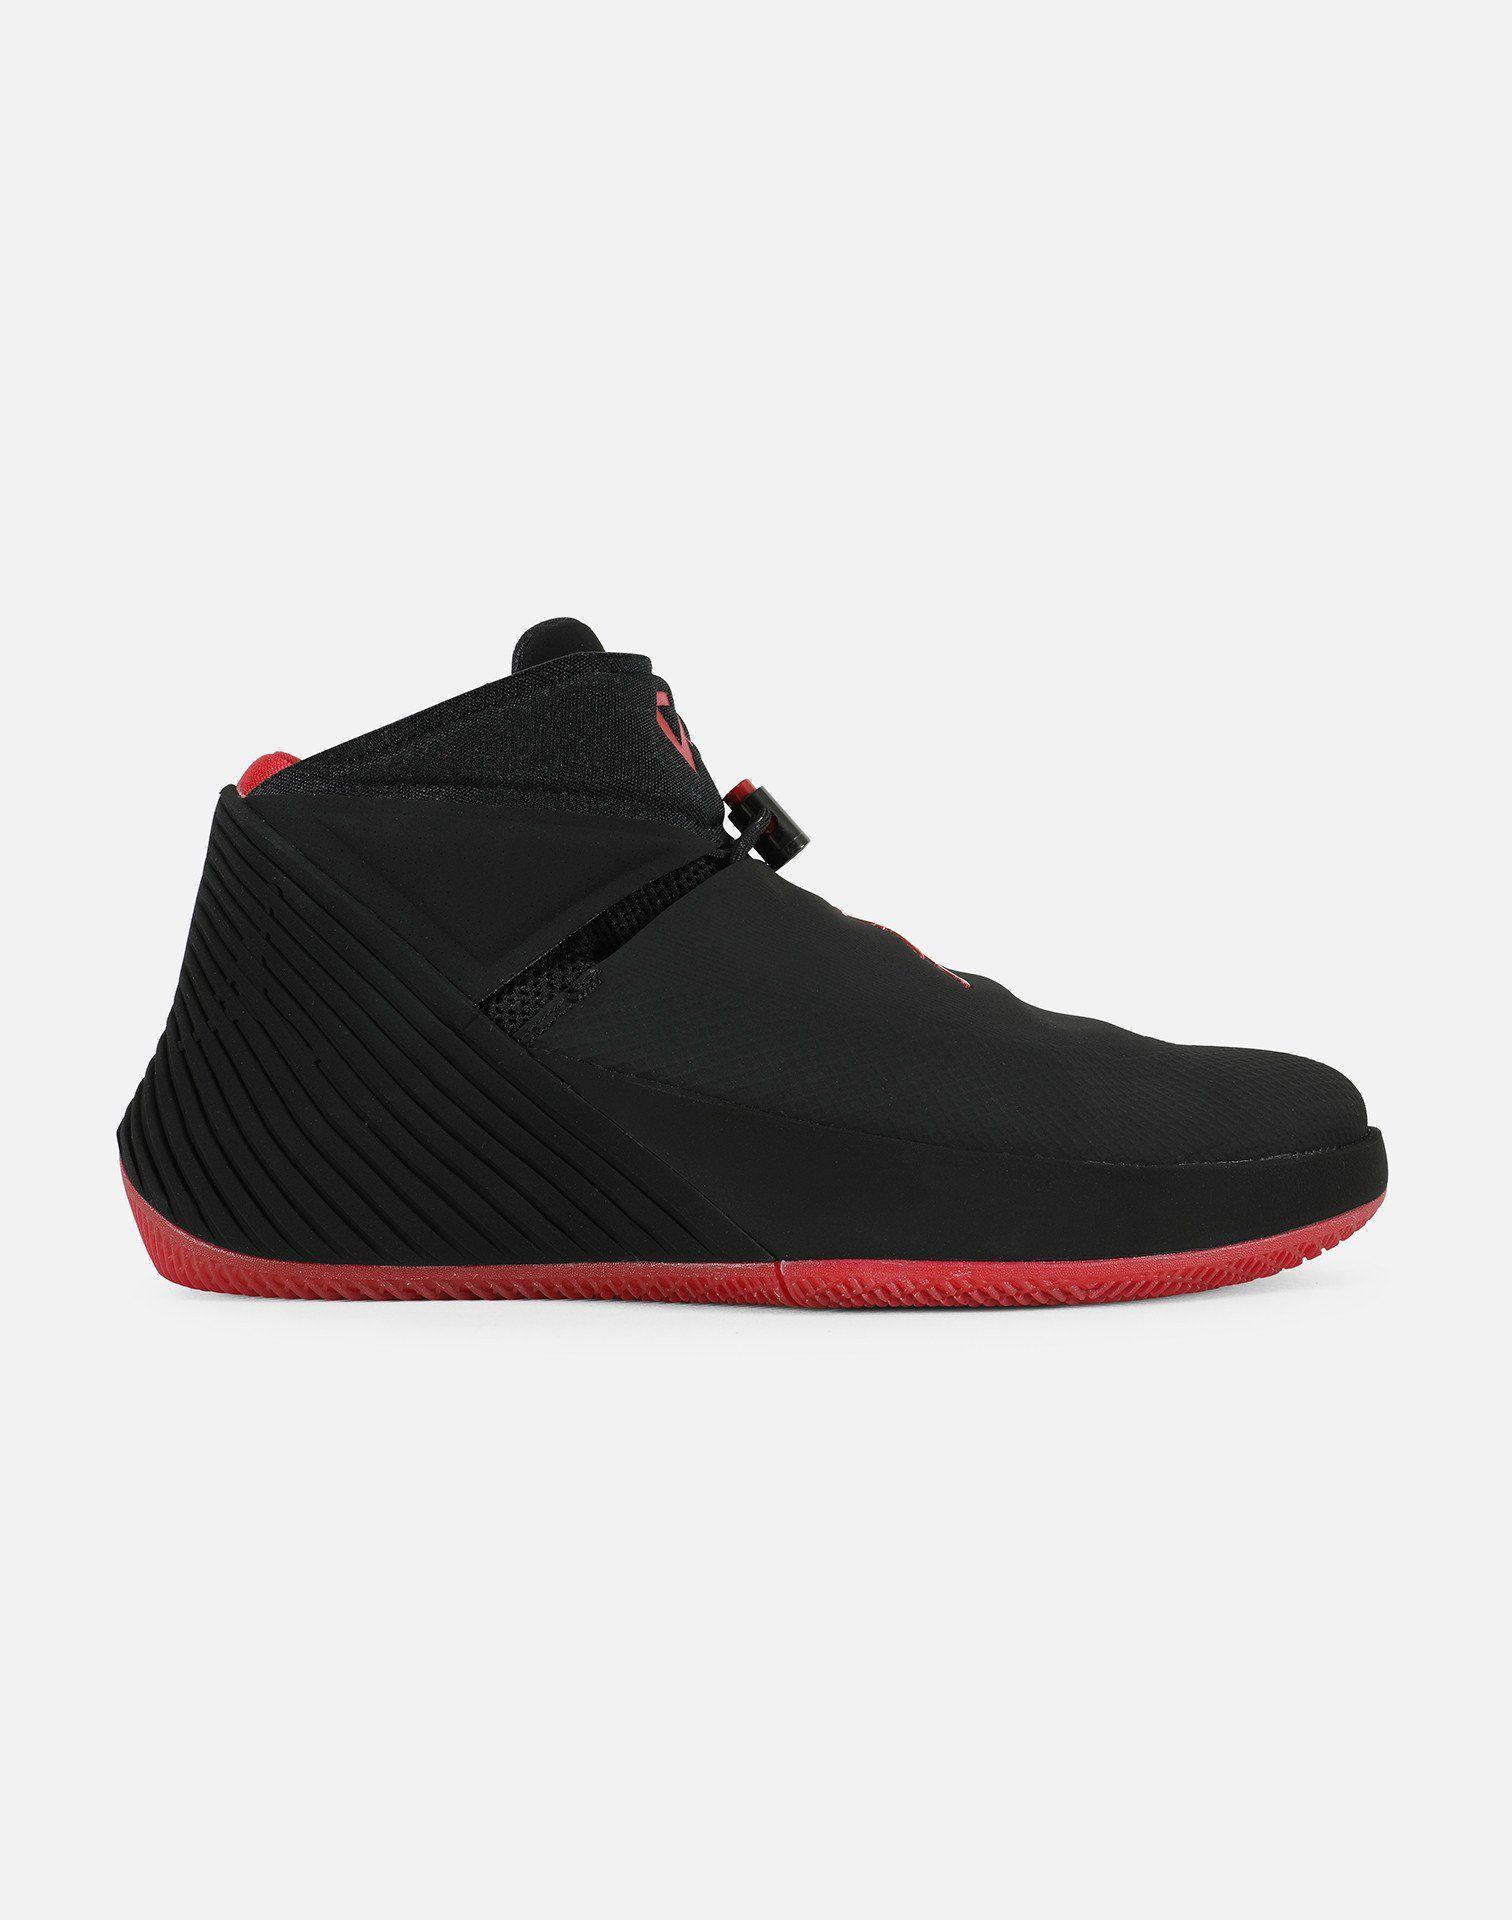 Jordan Men S Why Not Zer0 1 Bred Villa Free Running Shoes